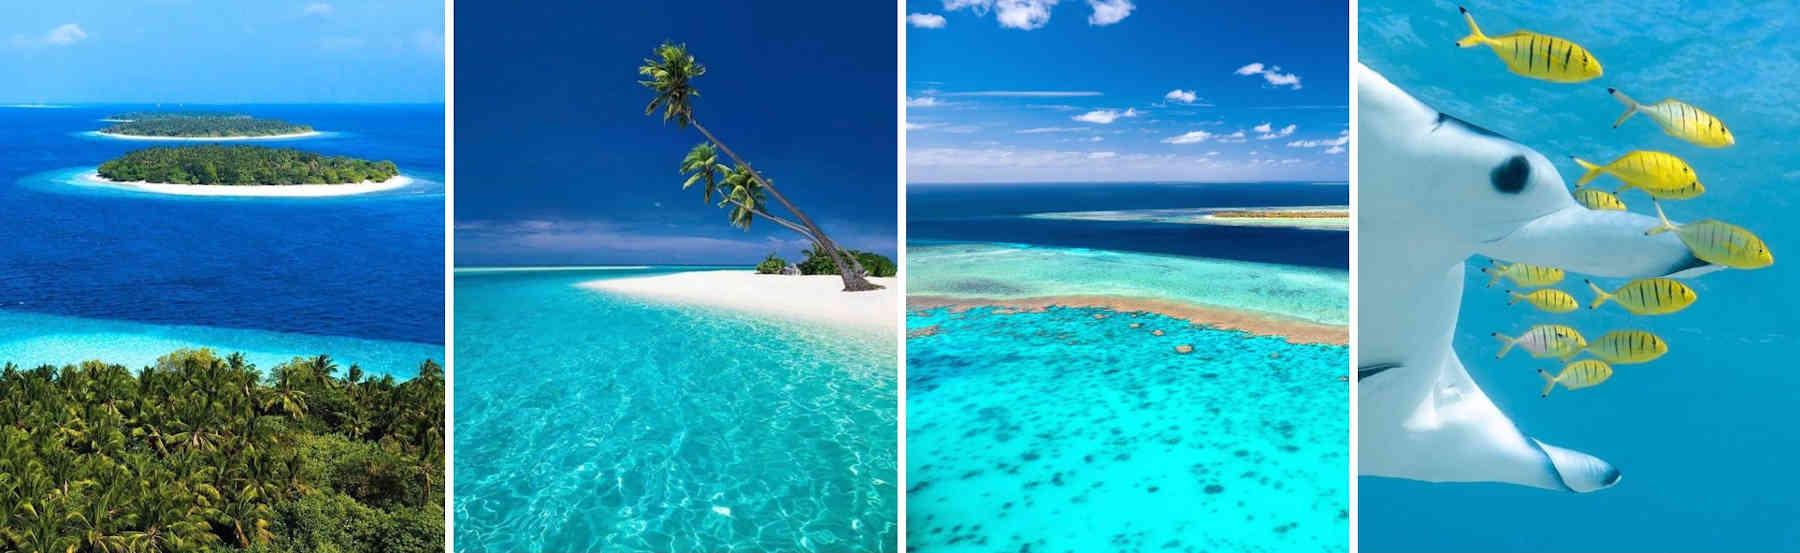 3-2_Malediven-Yachtcharter-Yacht-Mieten-Luxus_1